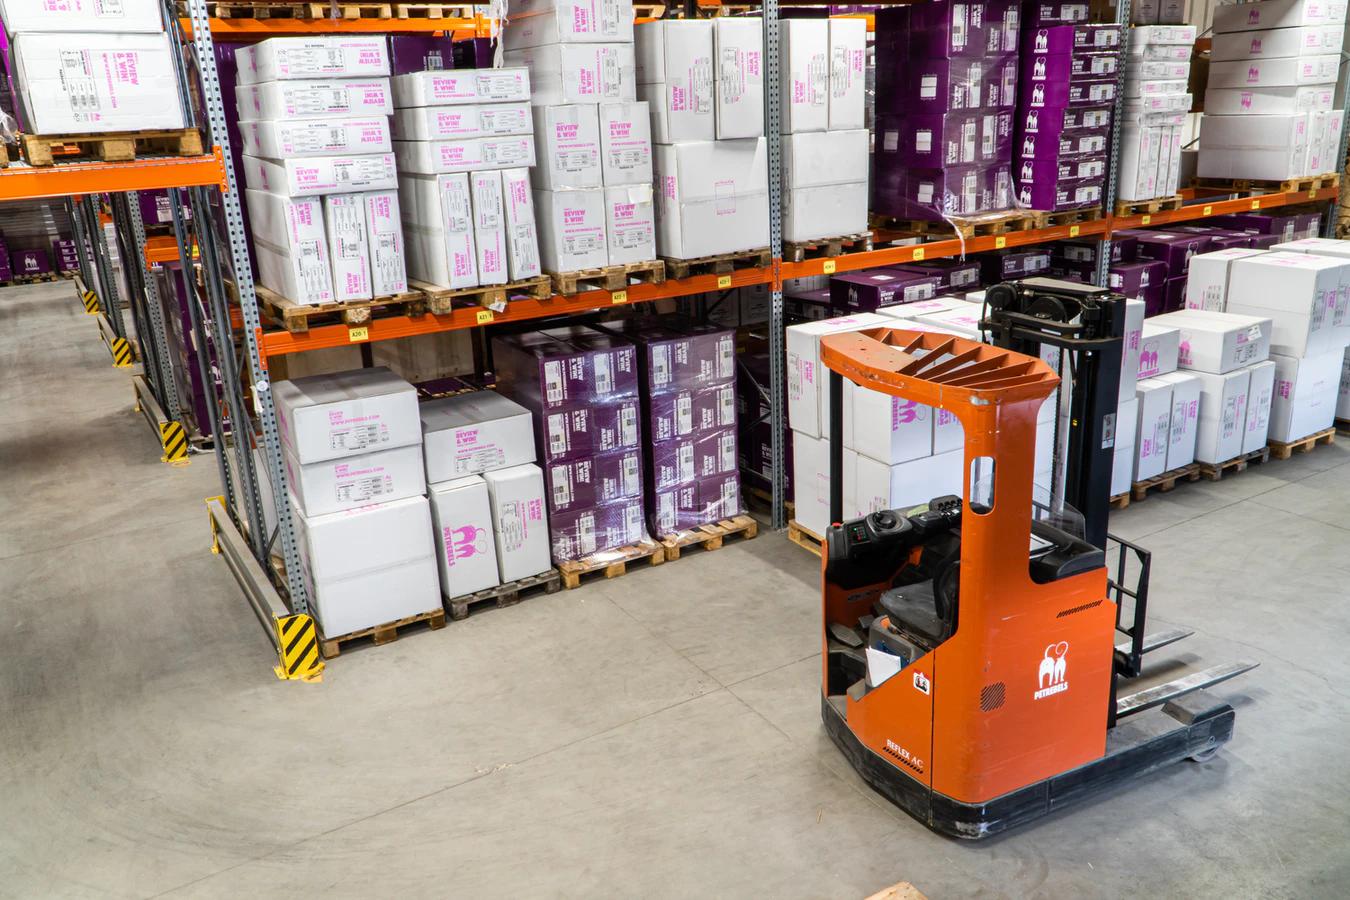 dropship inventory management at a warehouse